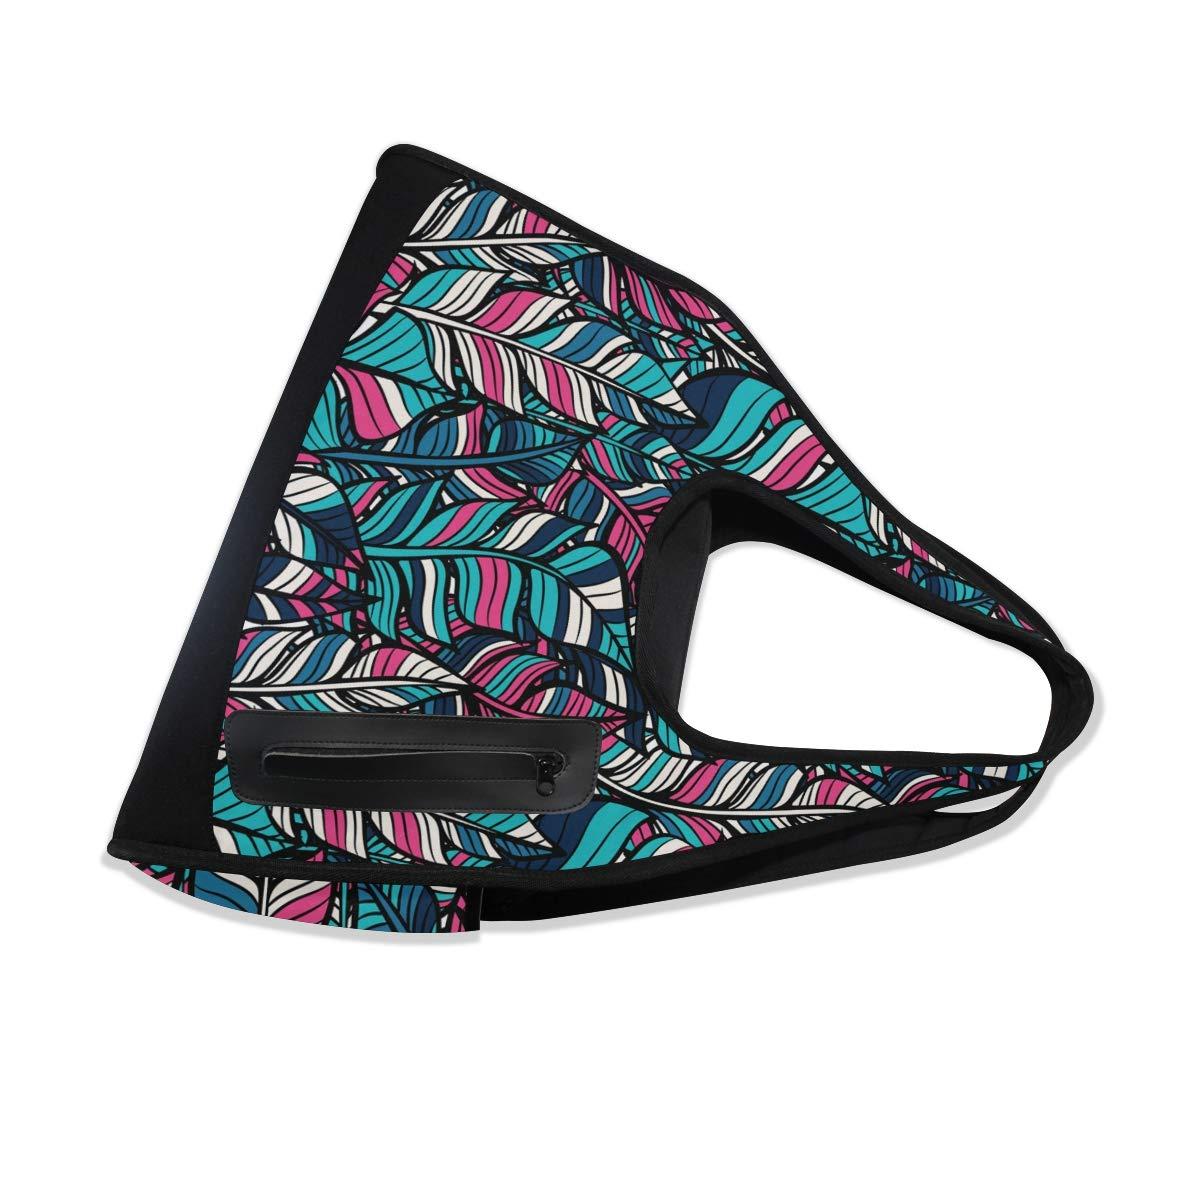 Boho Feathers Pattern Women Sports Gym Totes Bag Multi-Function Nylon Travel Shoulder Bag